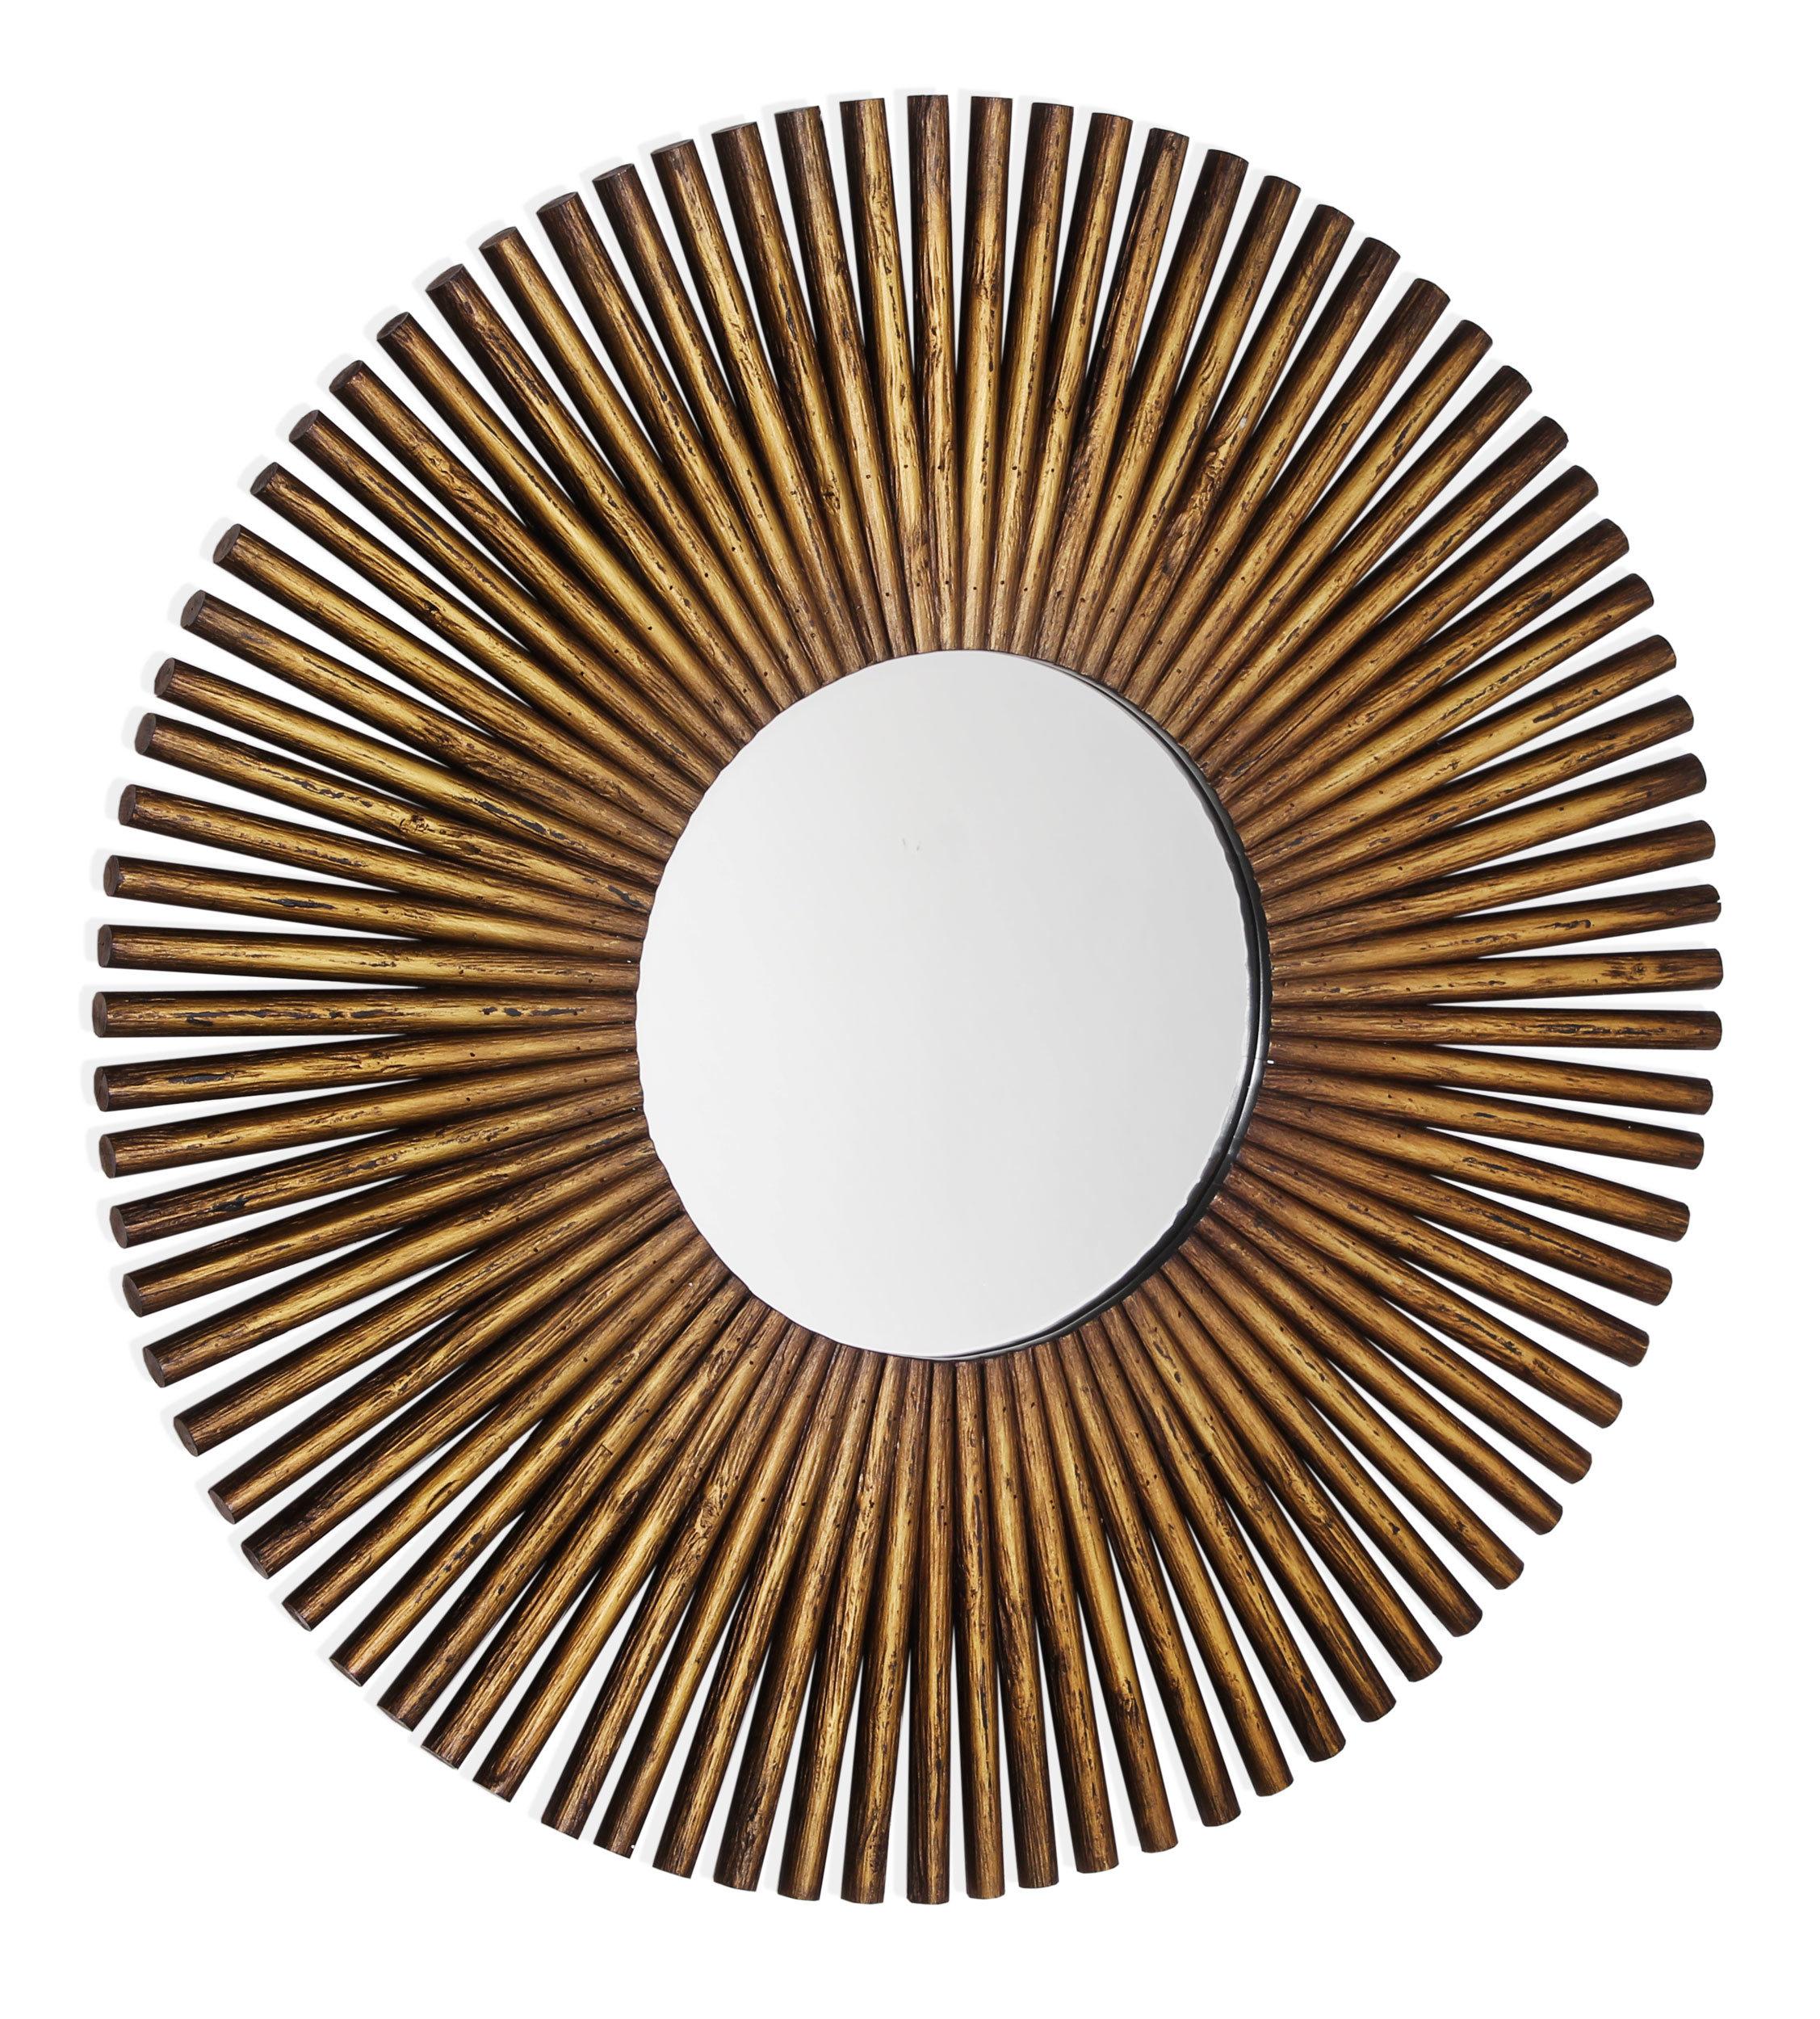 Orwin Wall Mirror Regarding Dandre Wall Mirrors (View 11 of 20)